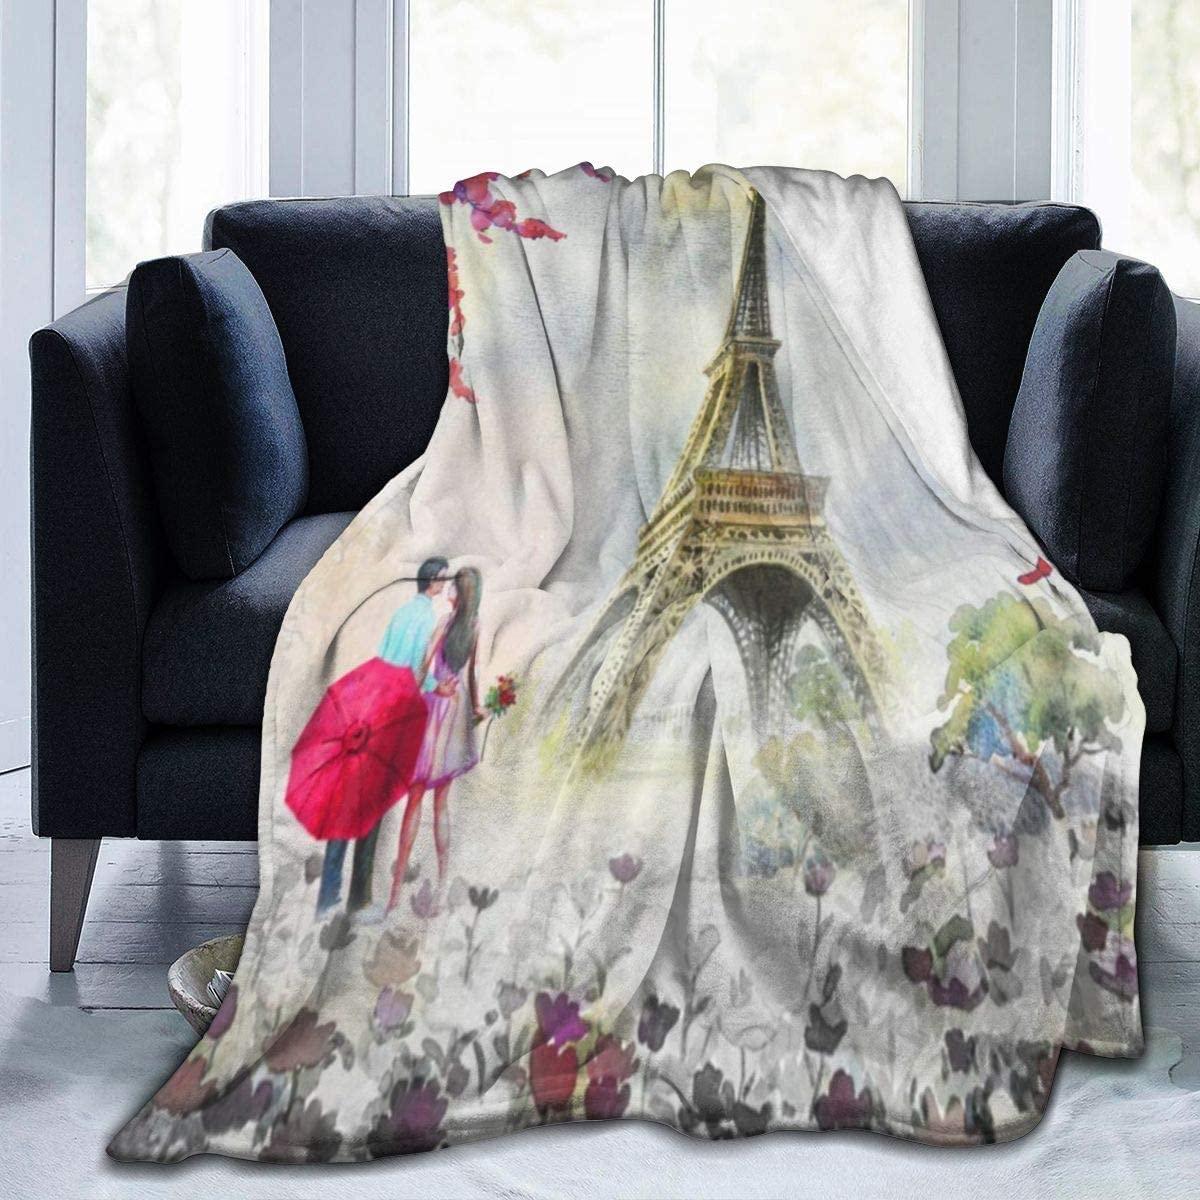 SLHFPX Micro Fleece Plush Soft Baby Blanket Romantic Eiffel Tower Lovers Fluffy Warm Toddler Bed/Crib Blanket Lightweight Flannel Daycare Nap Kids Sleeping Tummy Time Throw Blanket Girls Boy 50